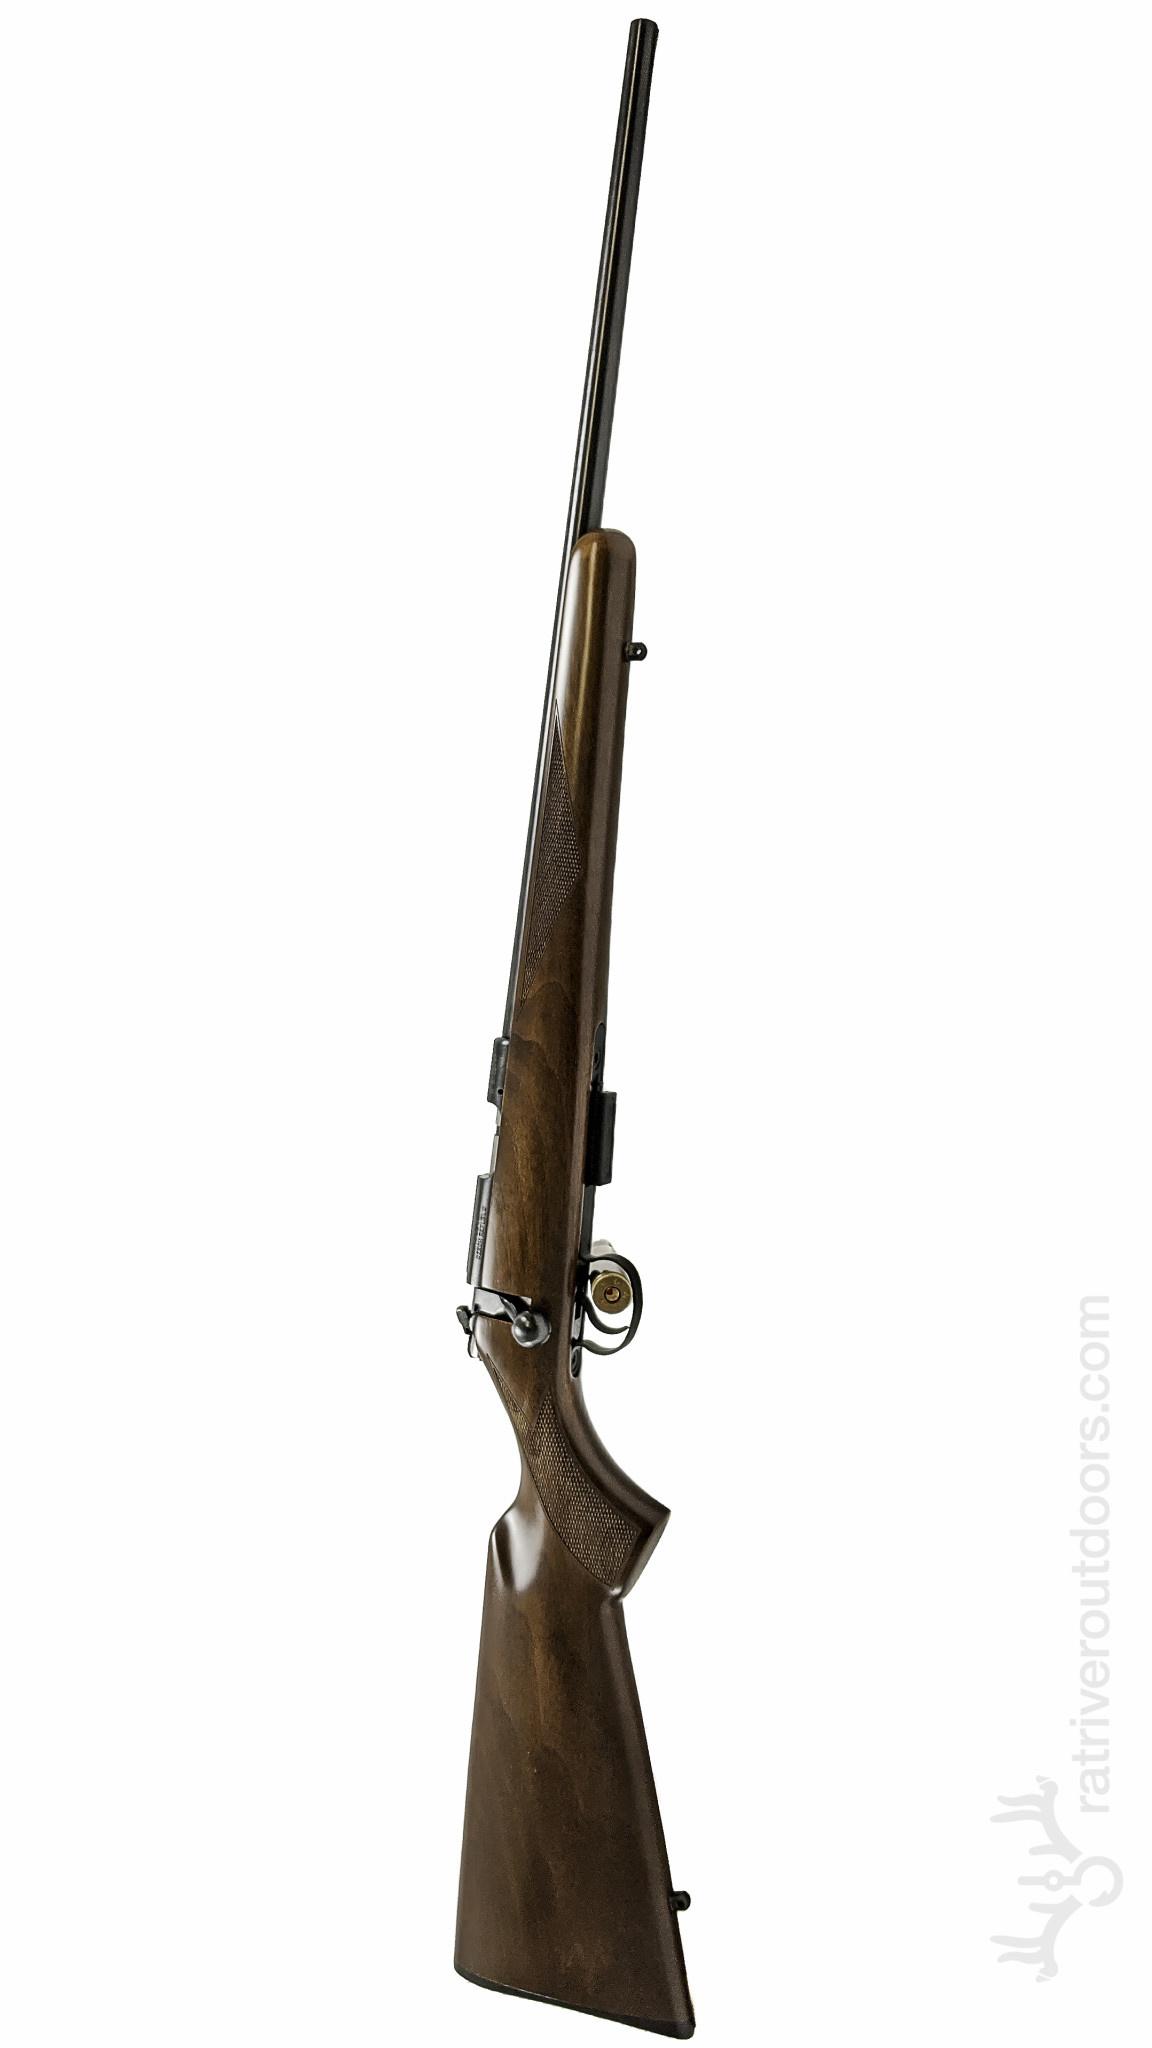 CZ 455 American Walnut .17 HMR